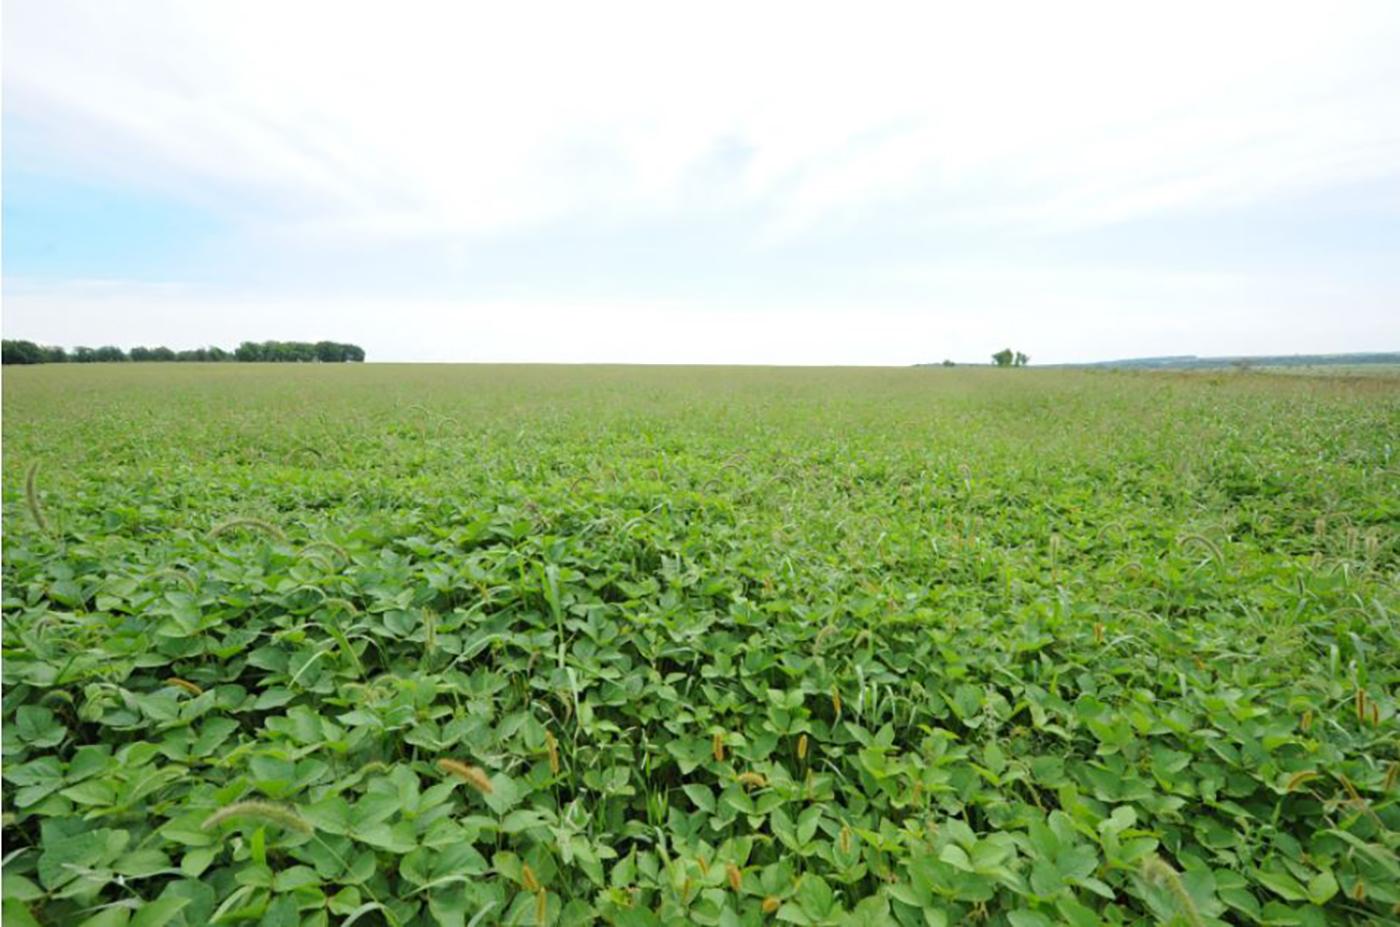 NON-GMO 압착 콩기름/연해주 농장 고려인이 키운 순수 NON-GMO 압착 콩기름(420ml)  상세이미지4